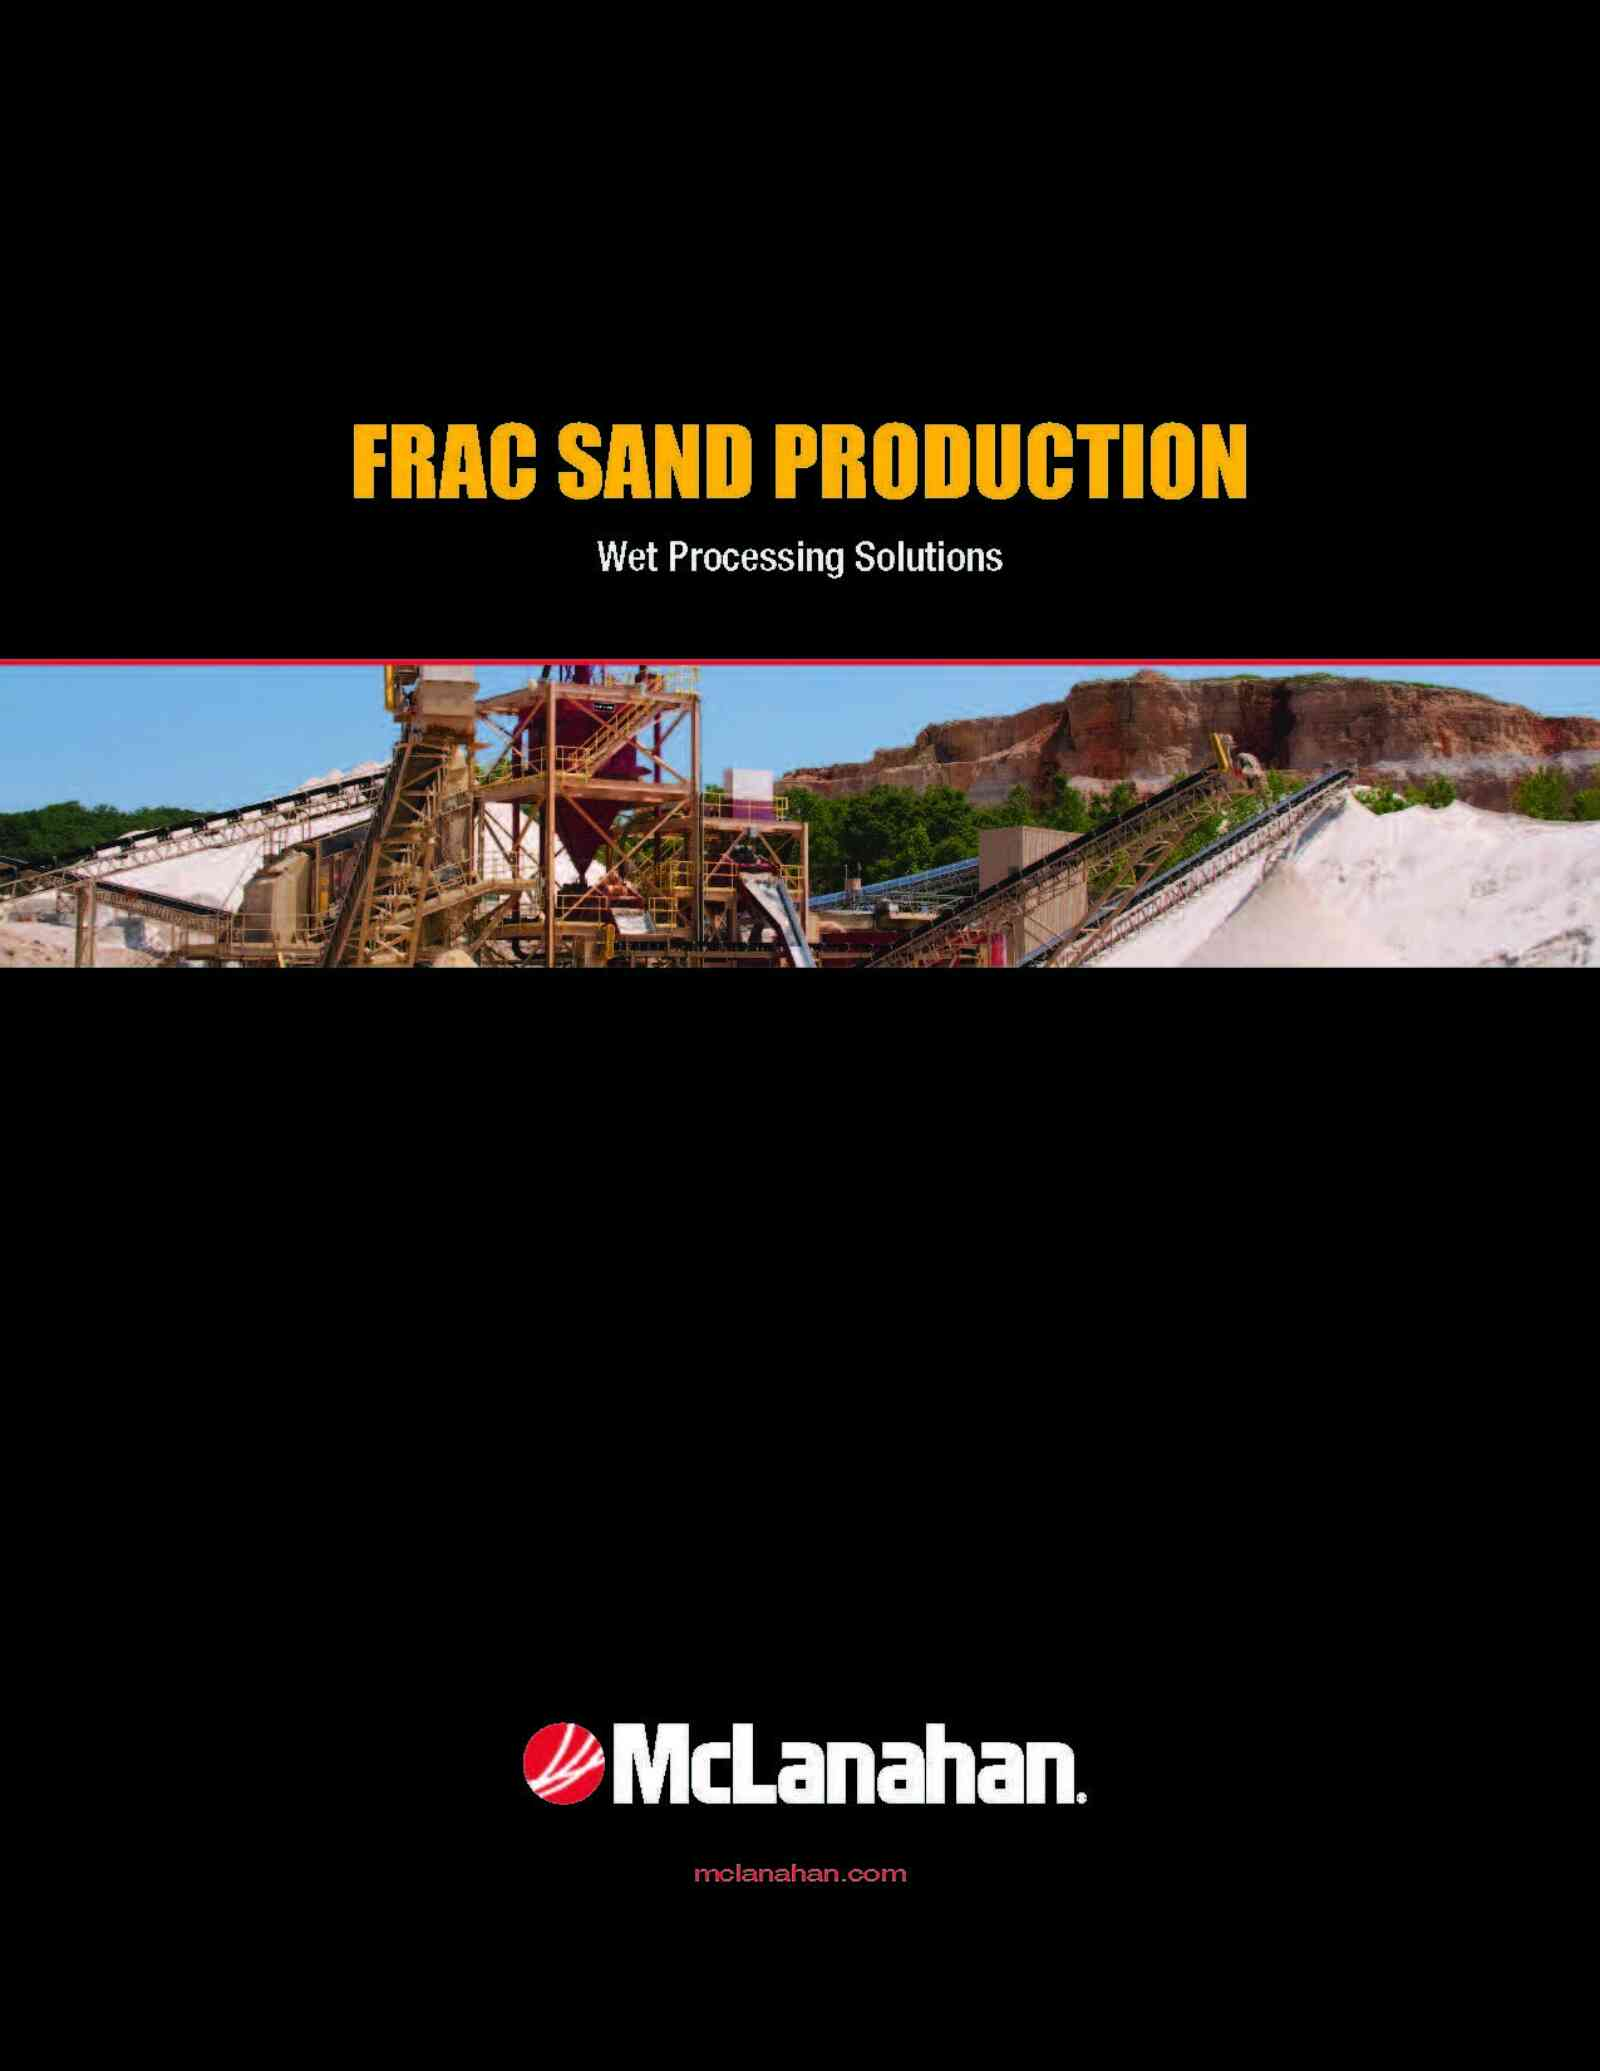 Frac Sand Brochure Image Page 1